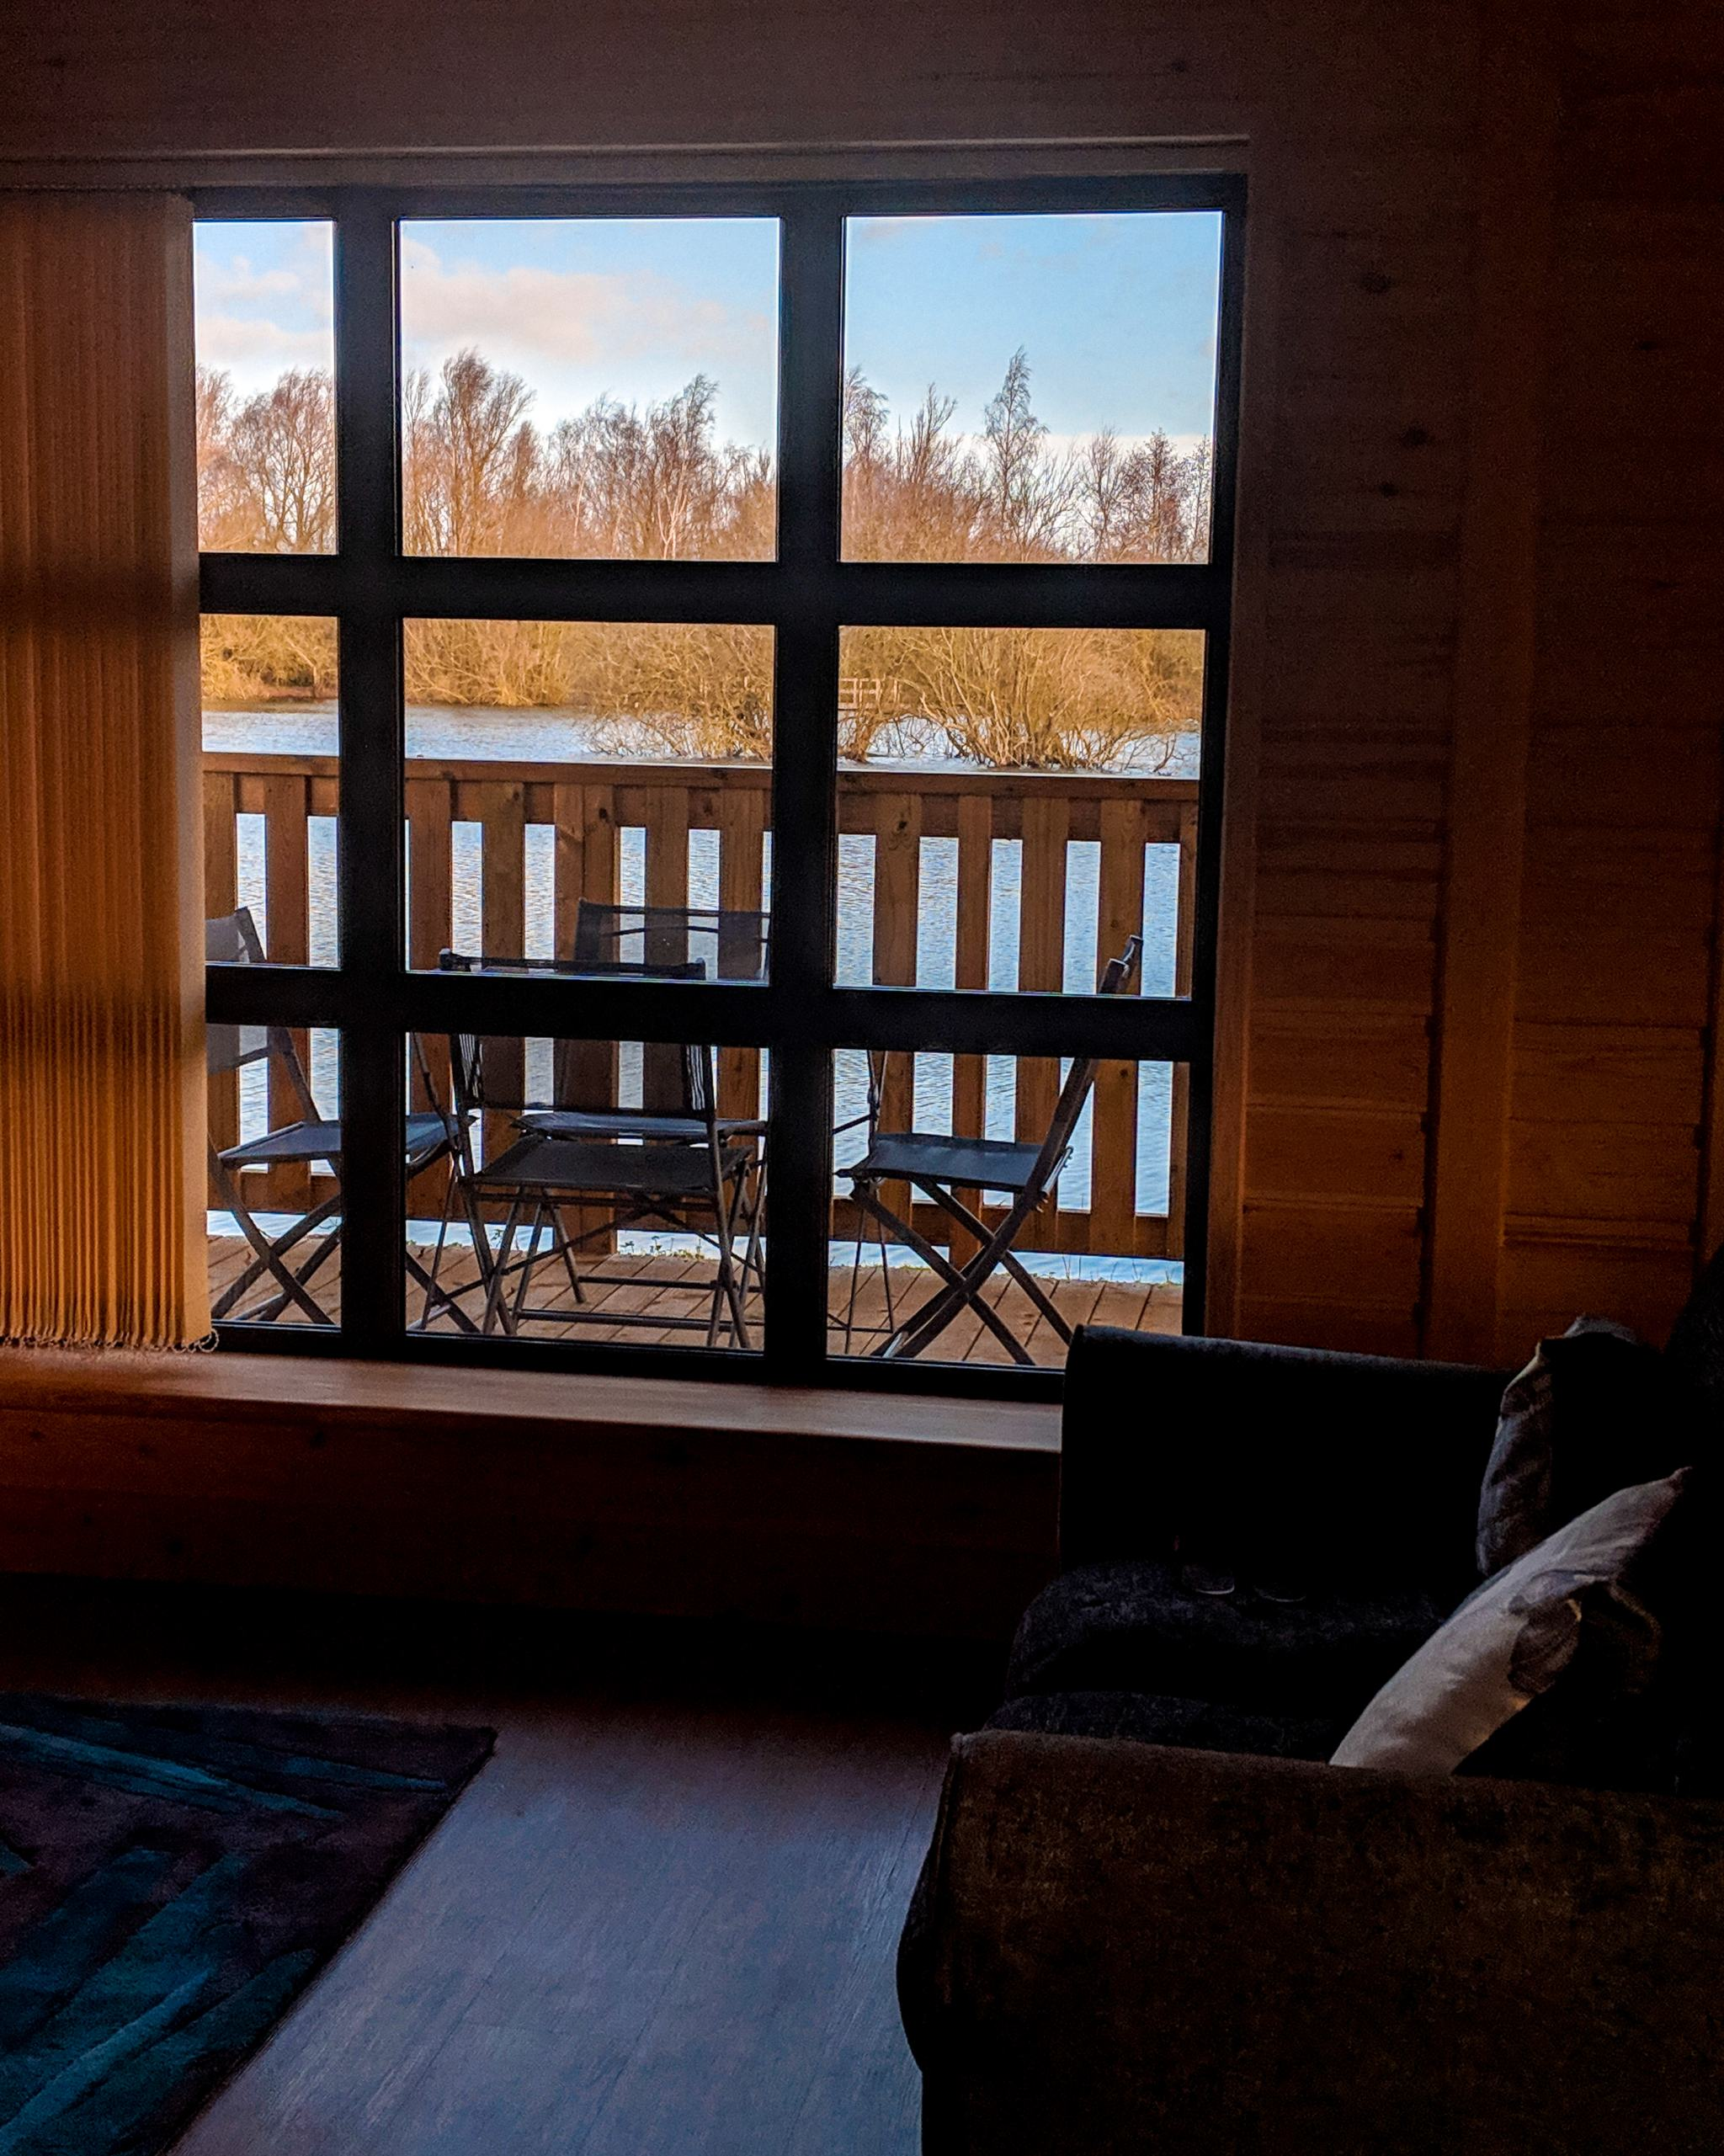 woodlakes-park-cabin-inside